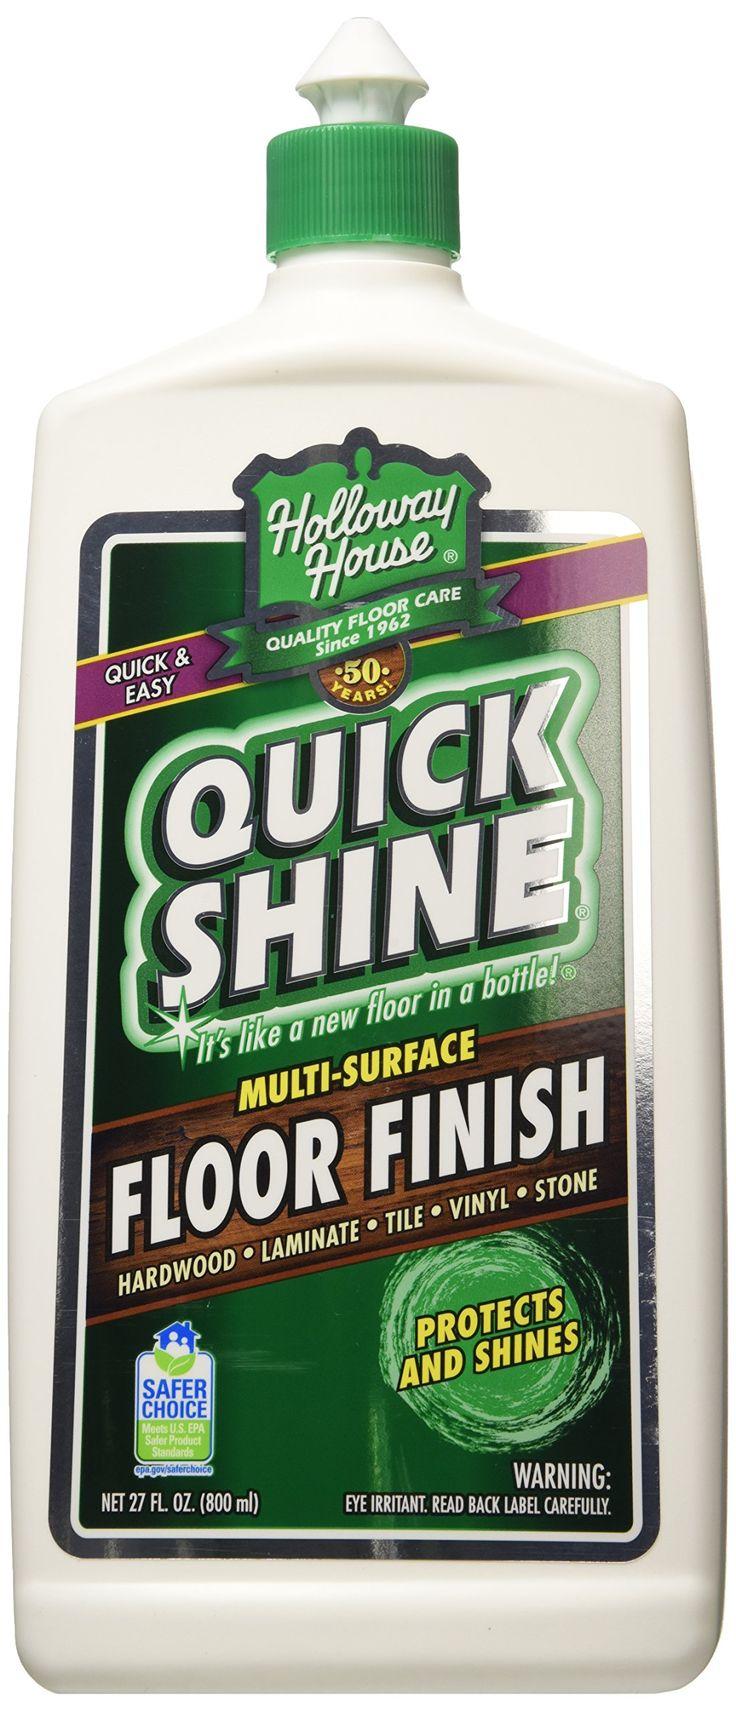 Amazon.com: Holloway House Inc 27Oz Quick Shine Floor Finish 77777: Health & Personal Care